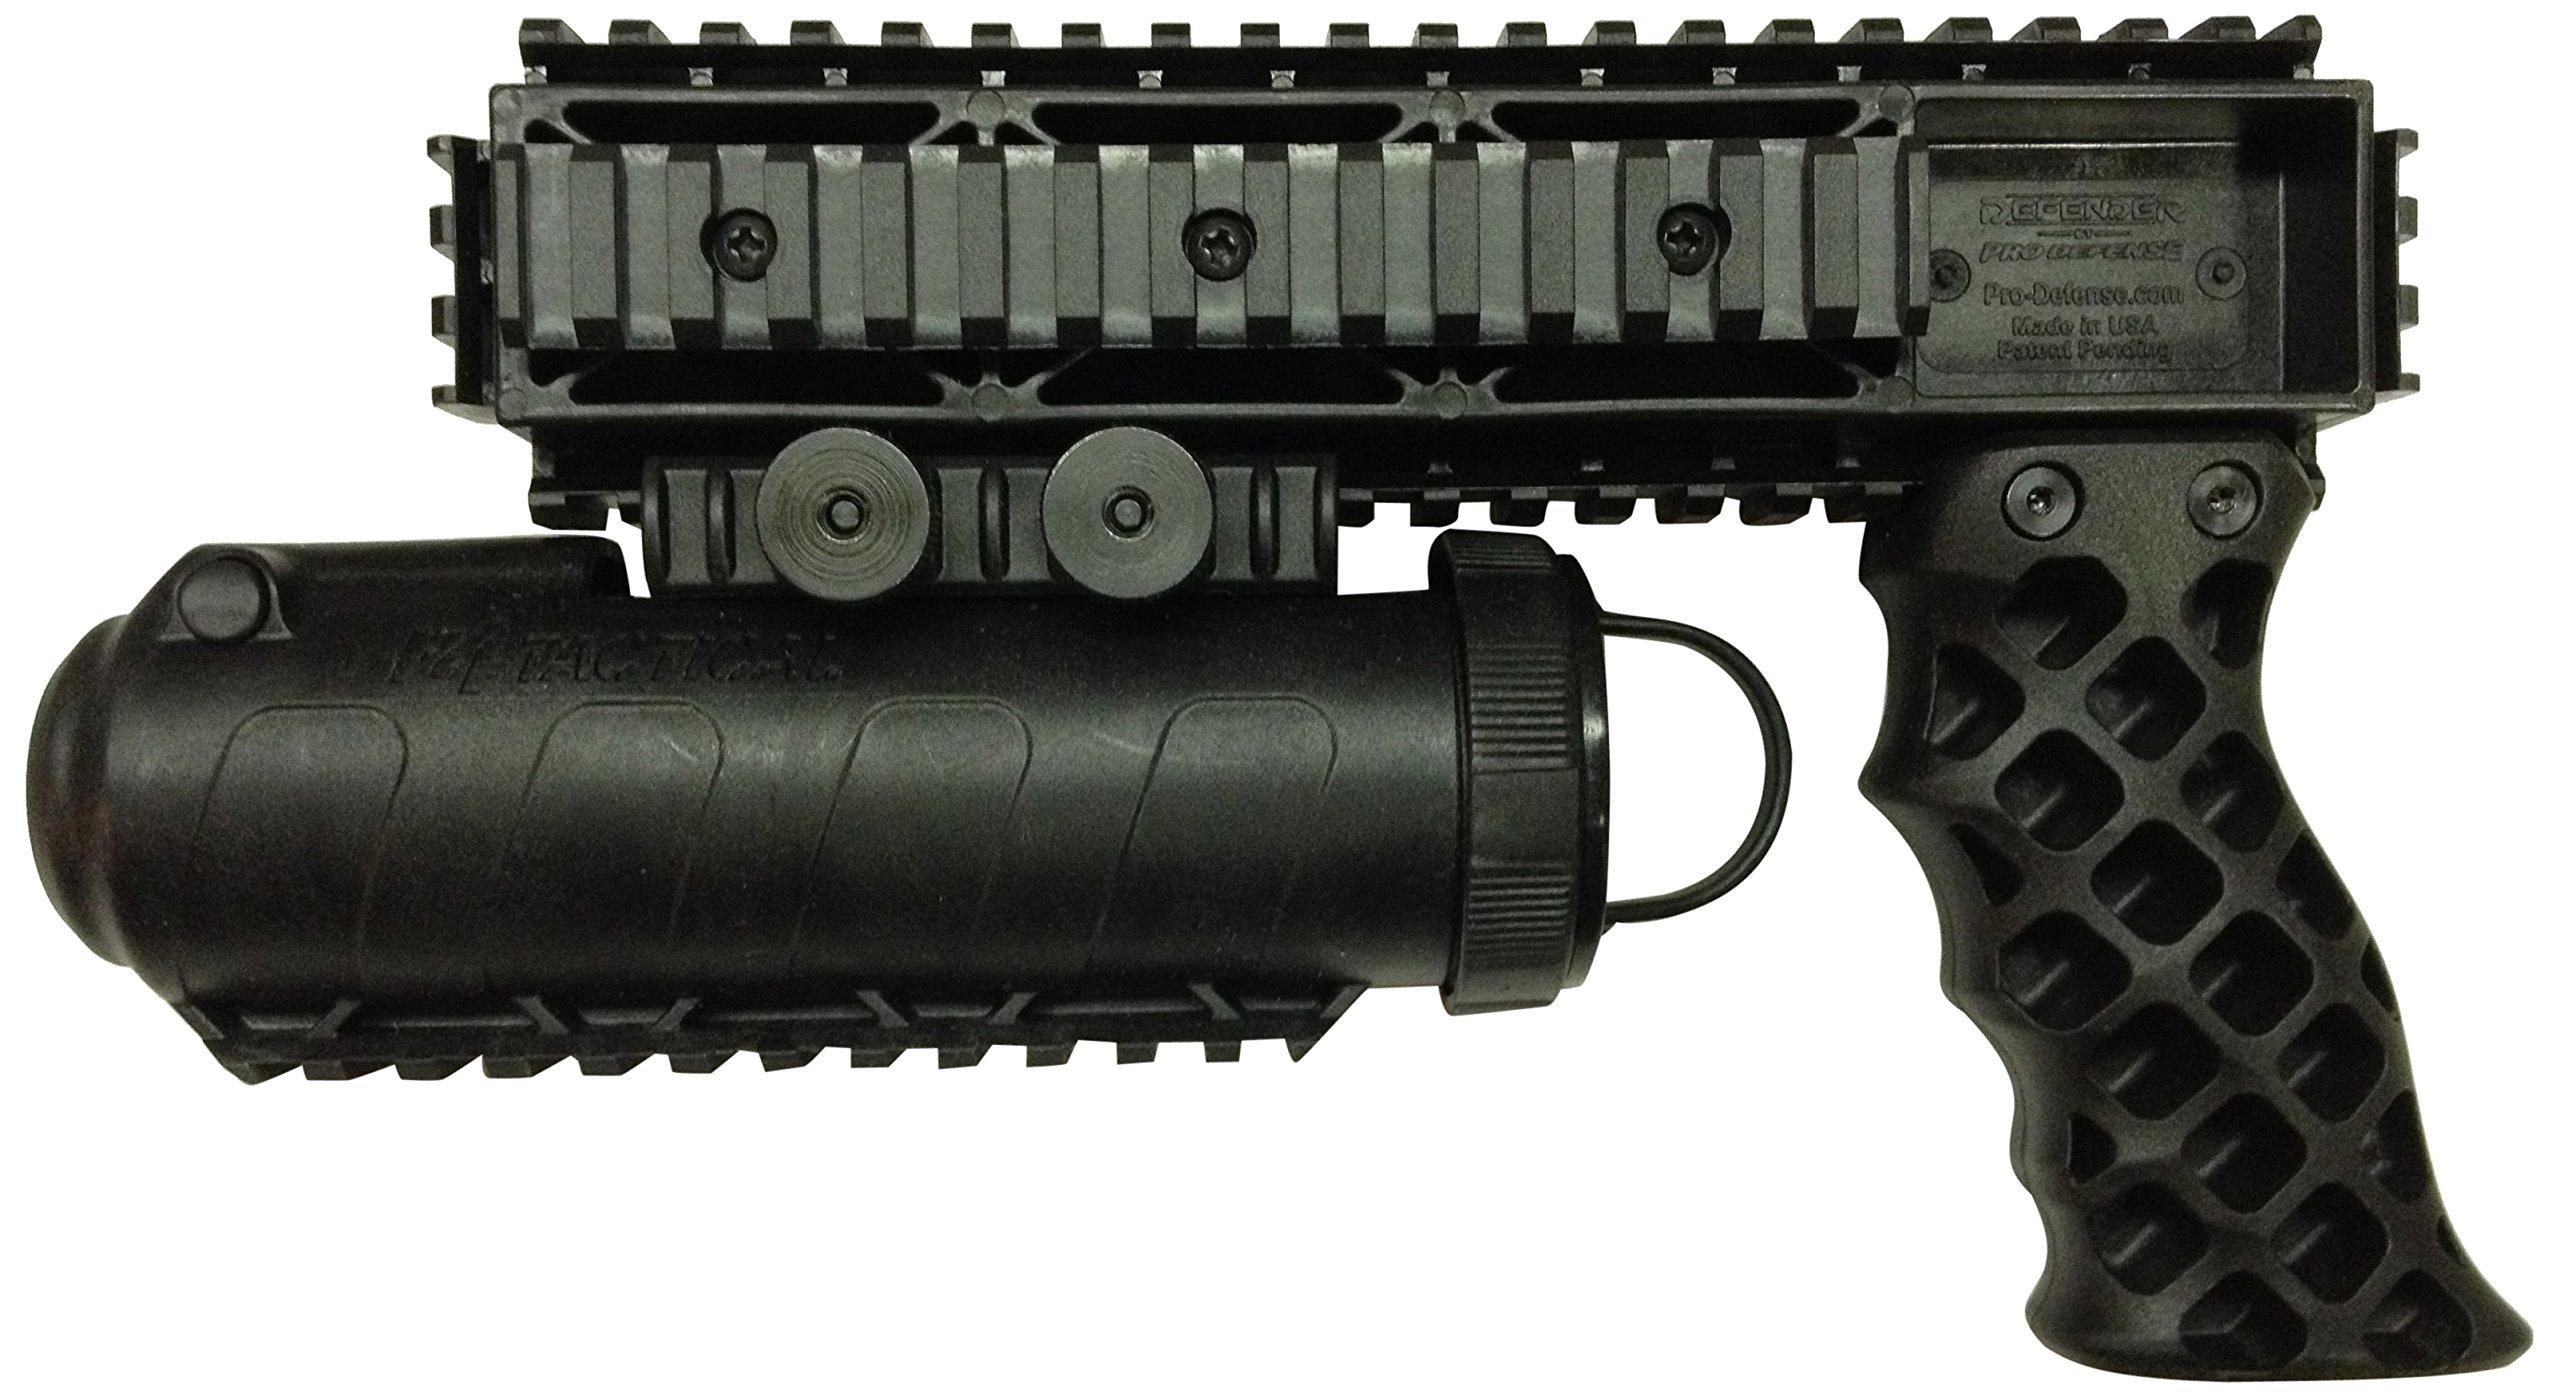 Pro-Defense The Defender Rail Mounted Pepper Spray System, Black, Left/Right